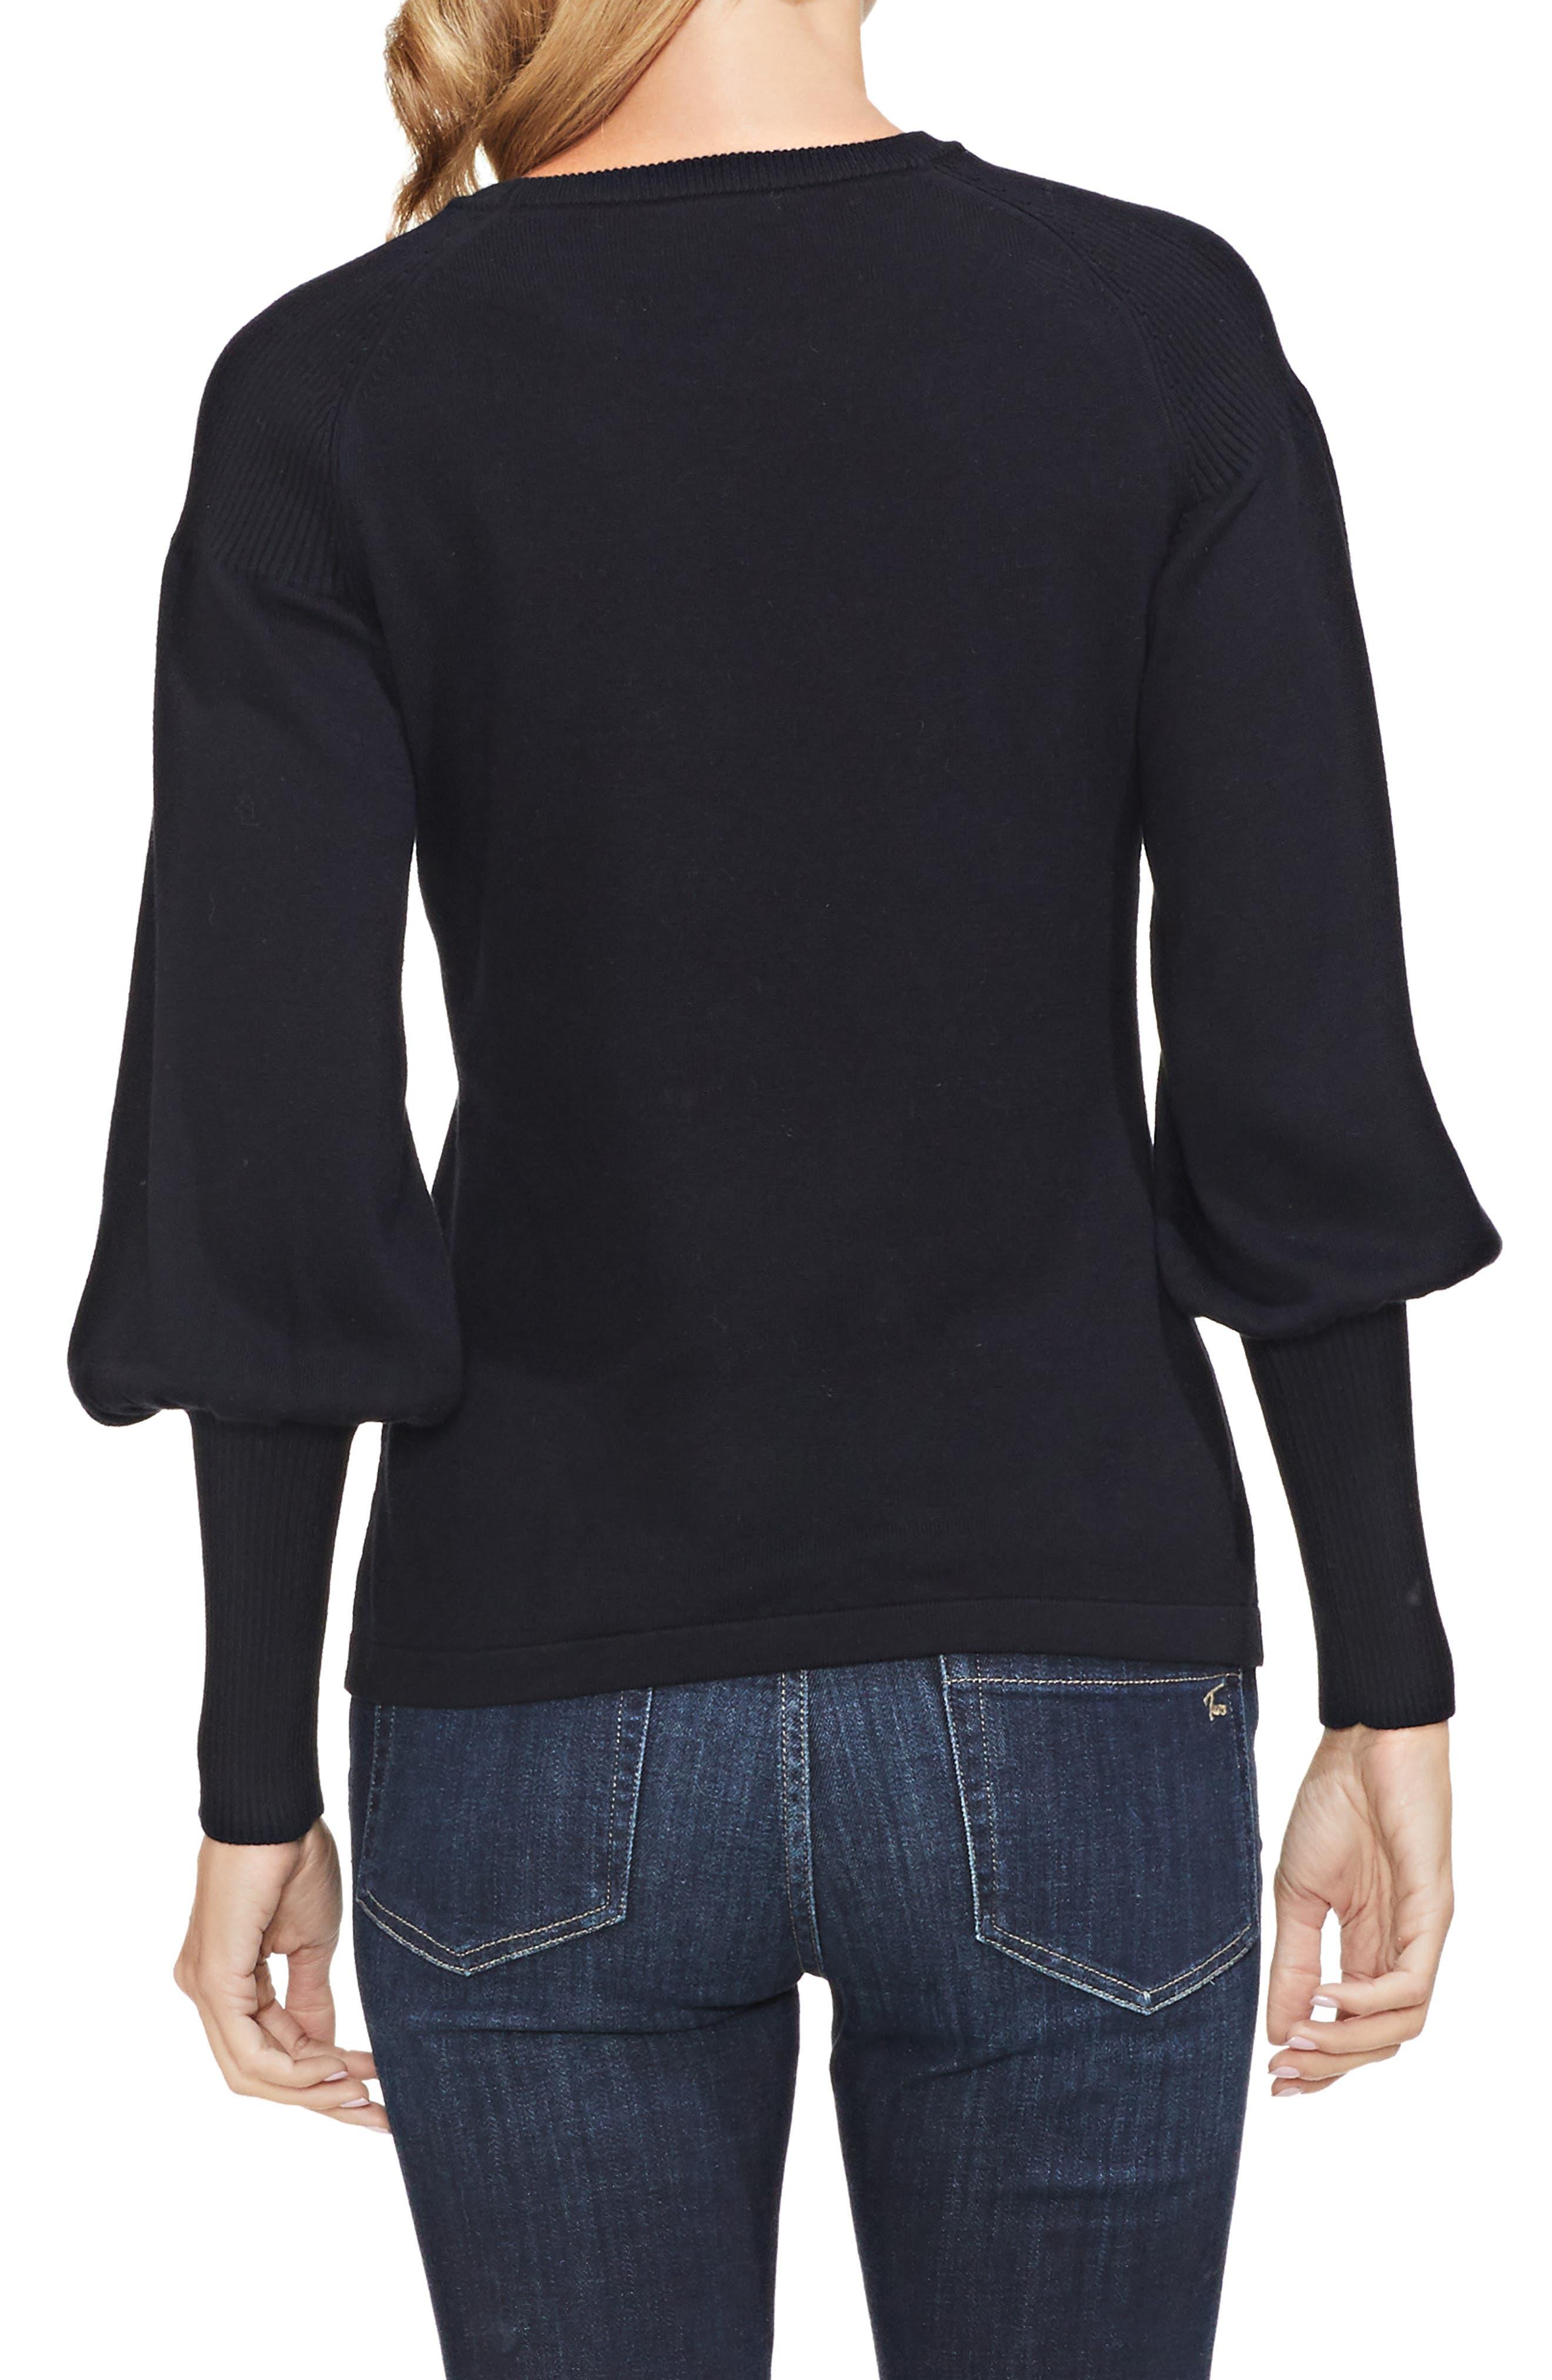 Blouson Sleeve Sweater,                             Alternate thumbnail 2, color,                             006